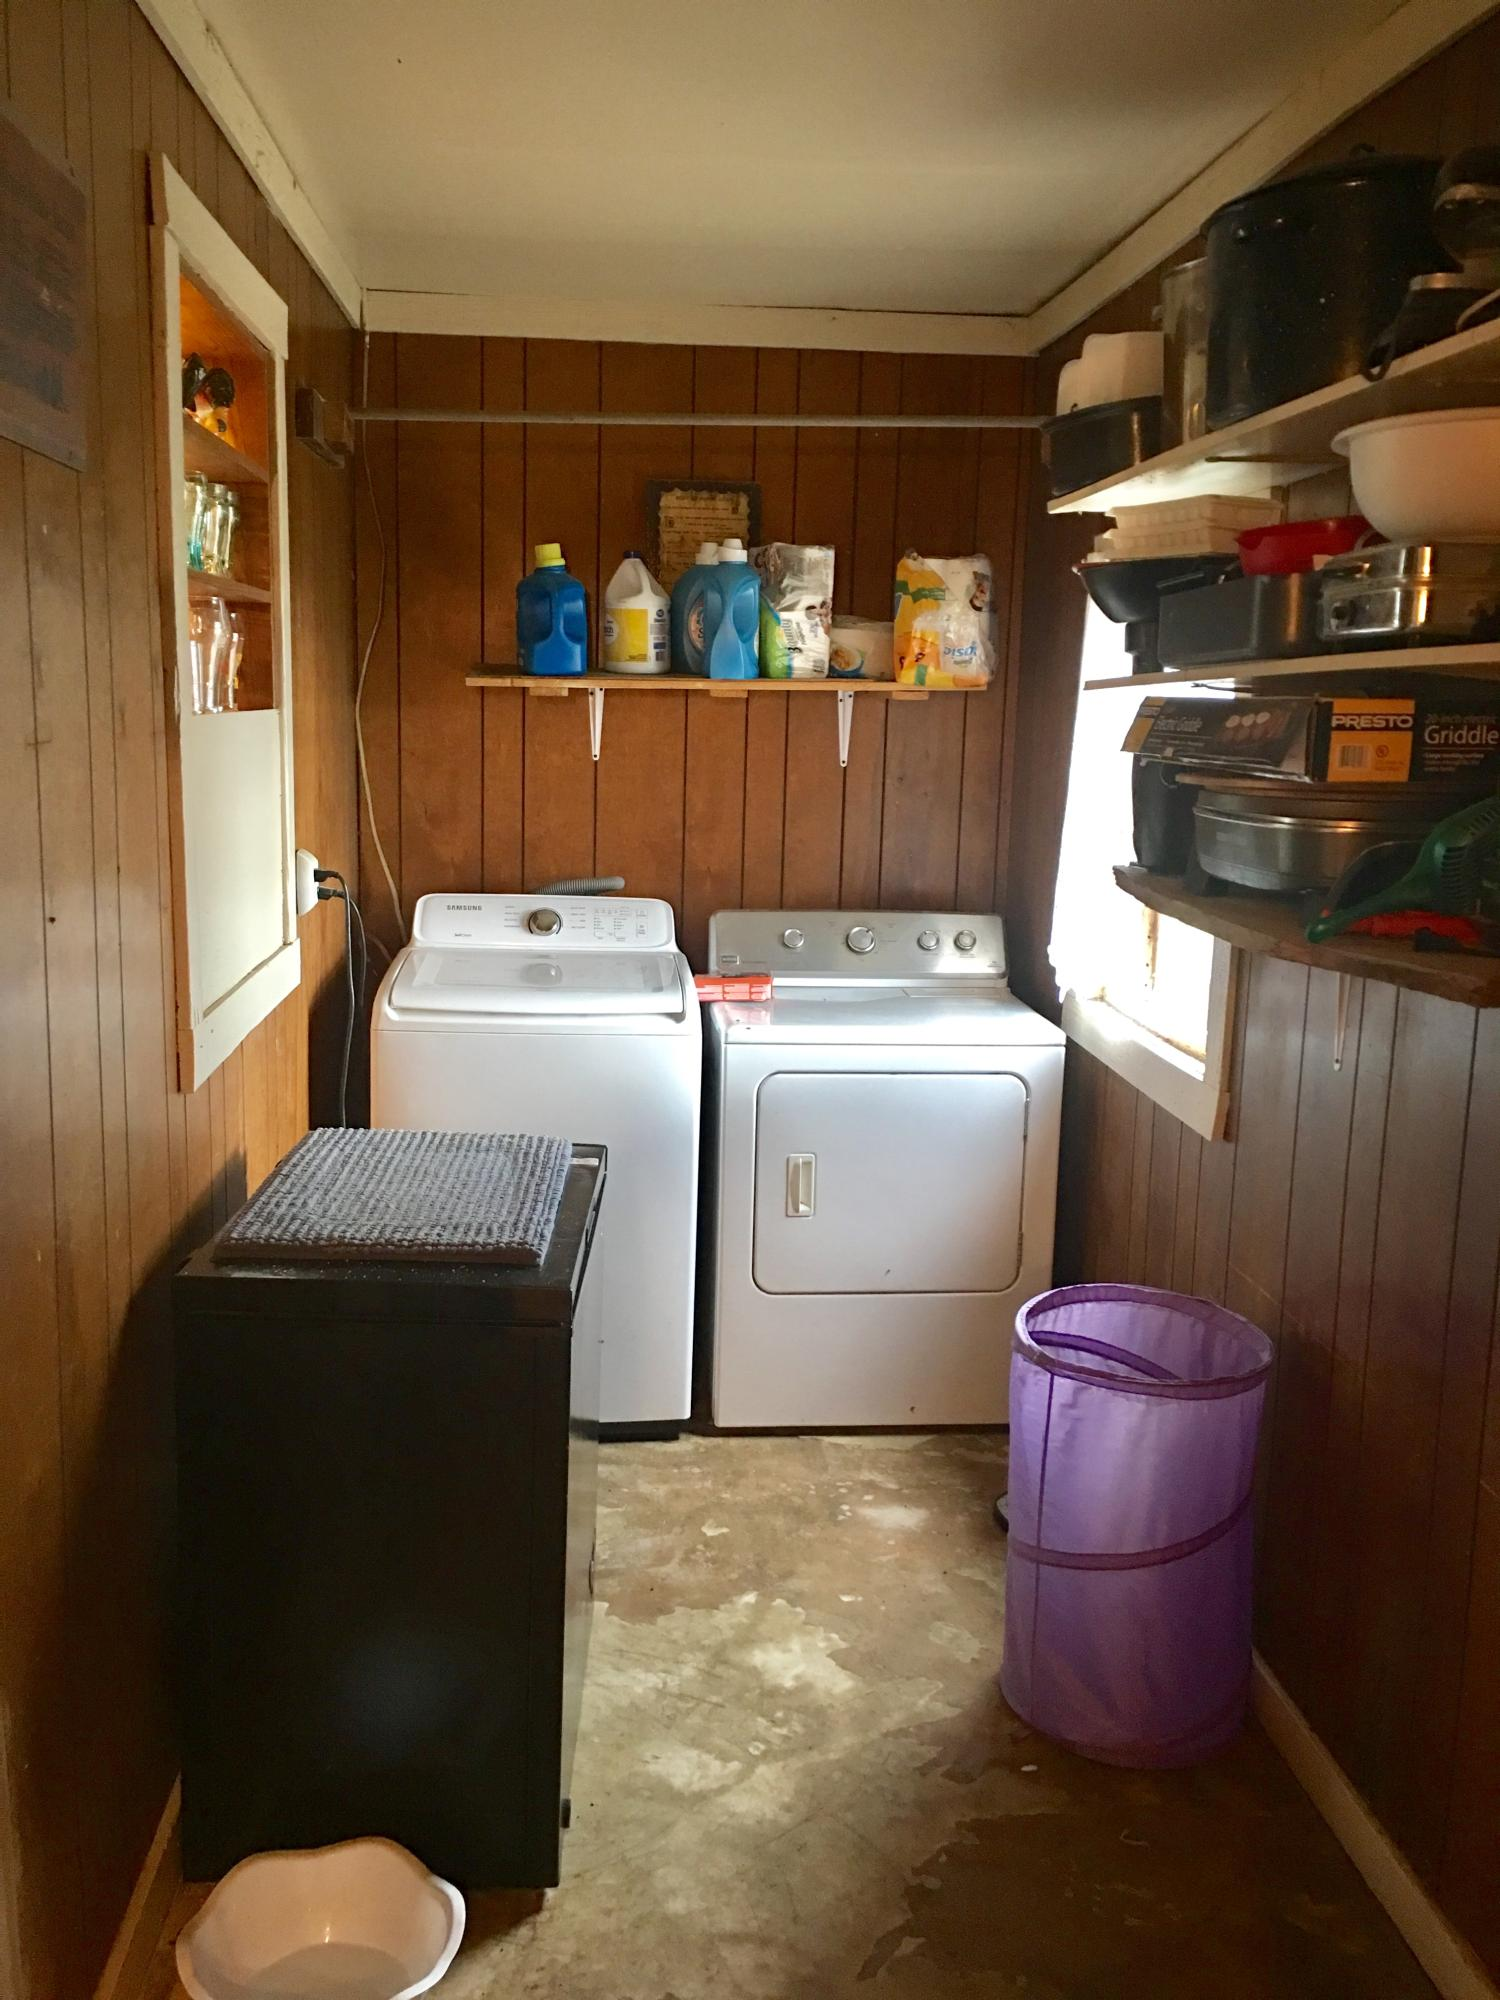 Main photo 10 of sold home in Hartman at 7699  Hwy 352 , Hartman, AR 72830